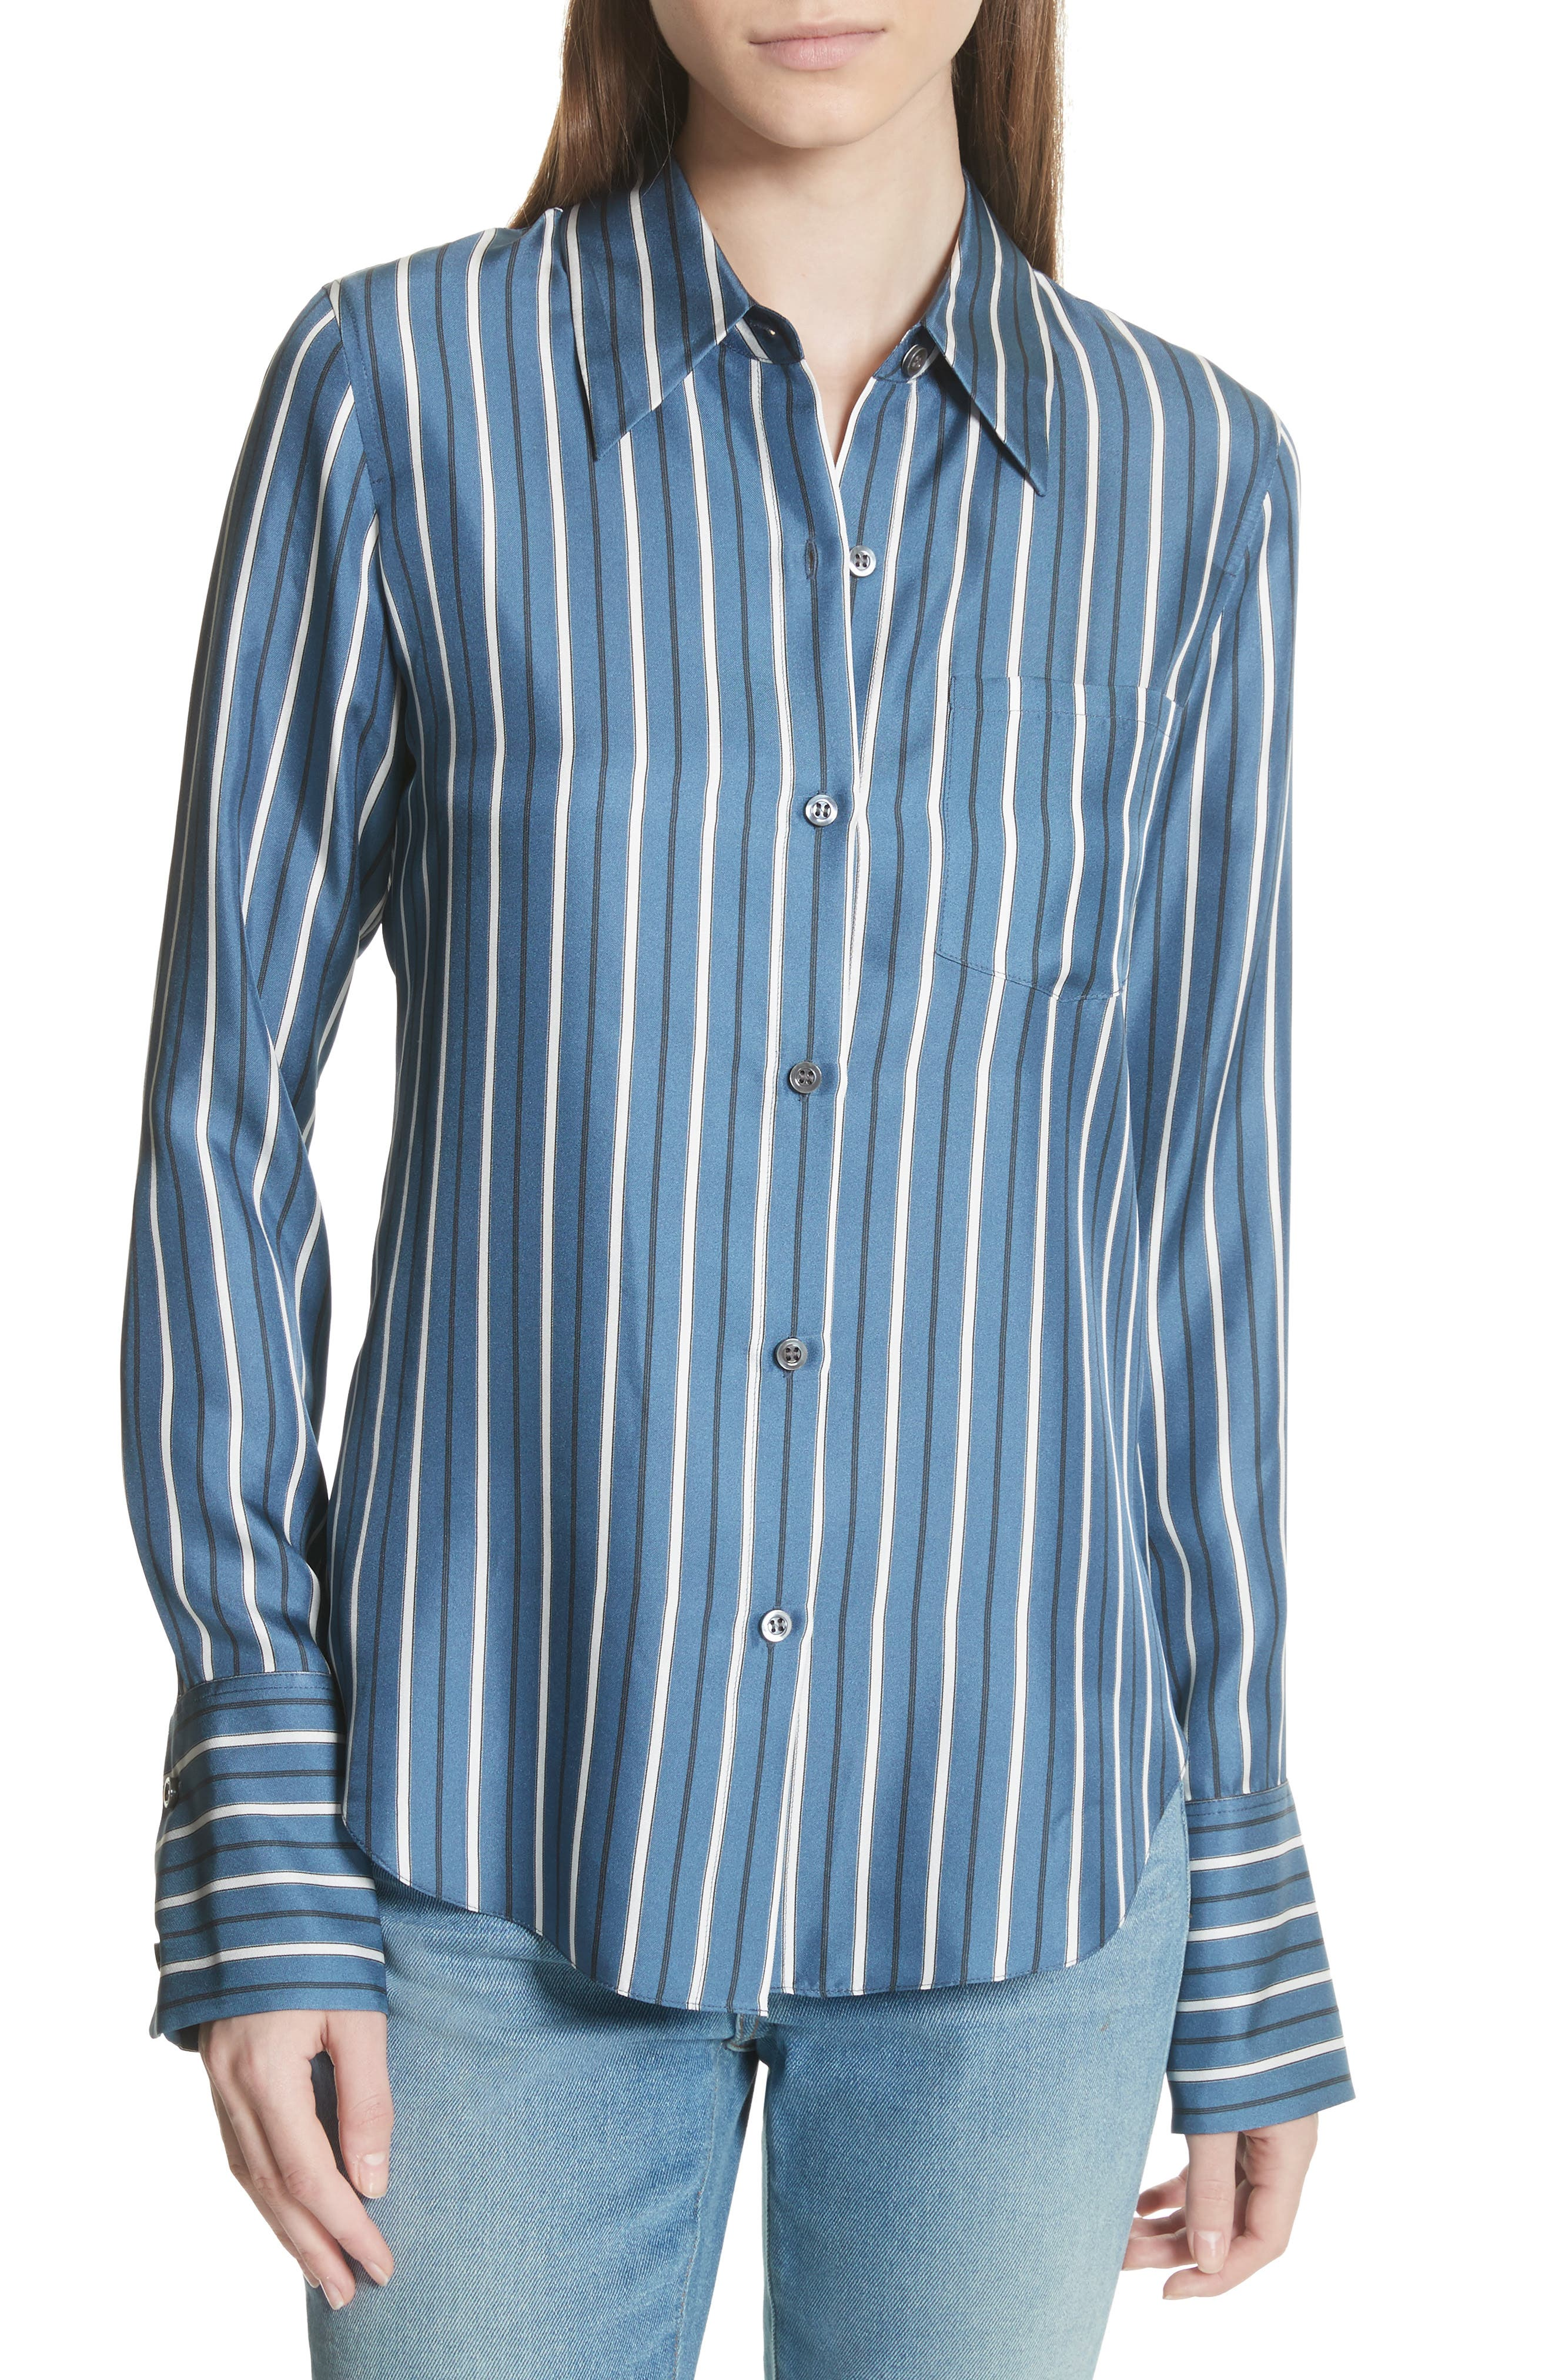 Darby Silk Button Shirt,                             Main thumbnail 1, color,                             Light Santorini Blue